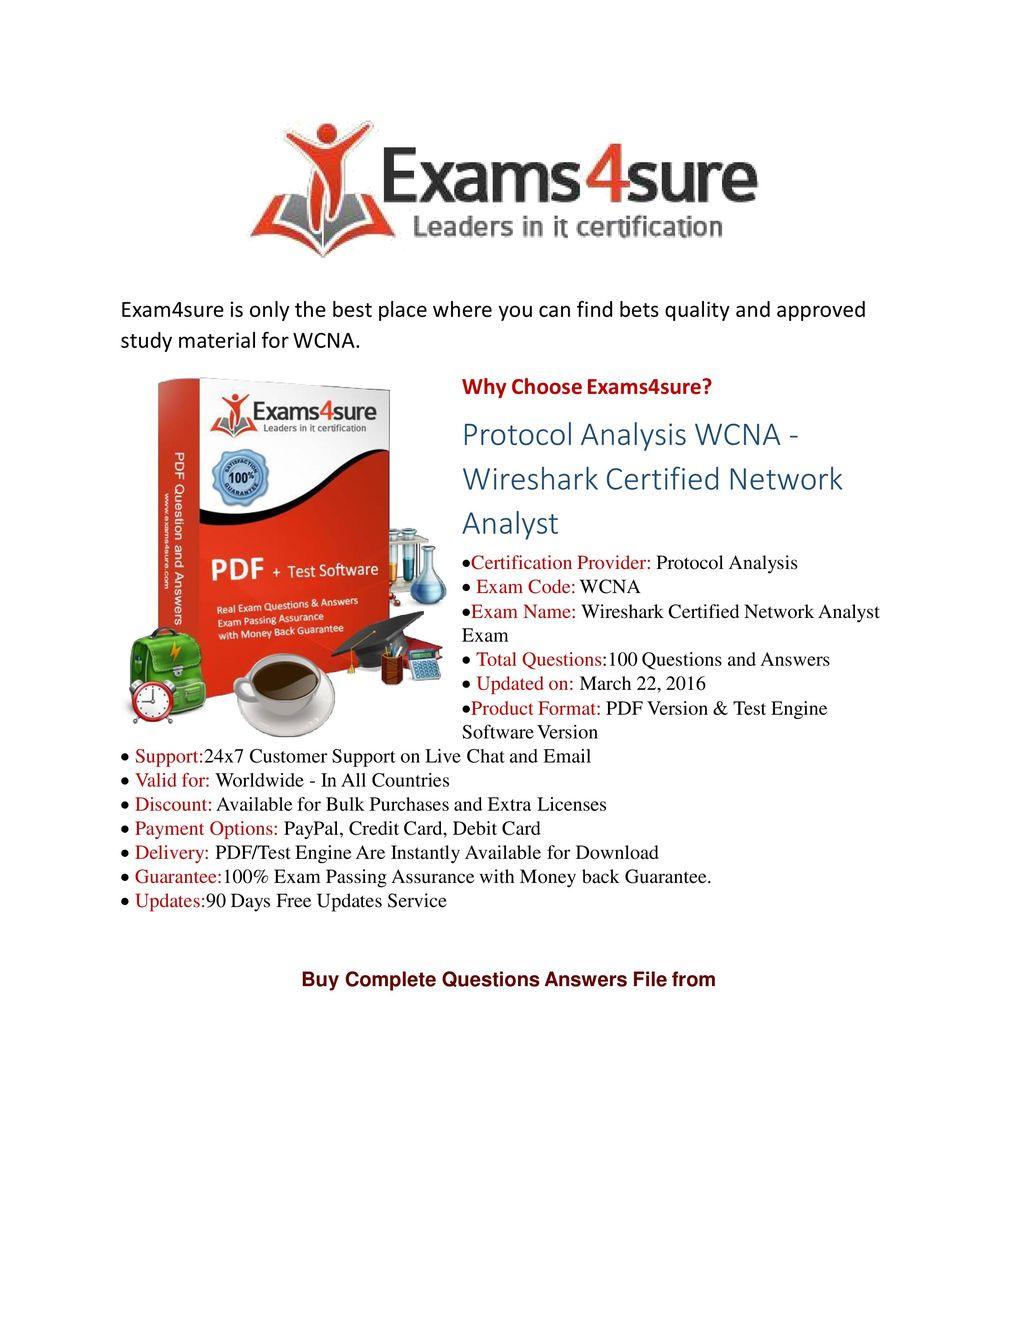 100 Exam Passing Guarantee Money Back Assurance Ppt Download